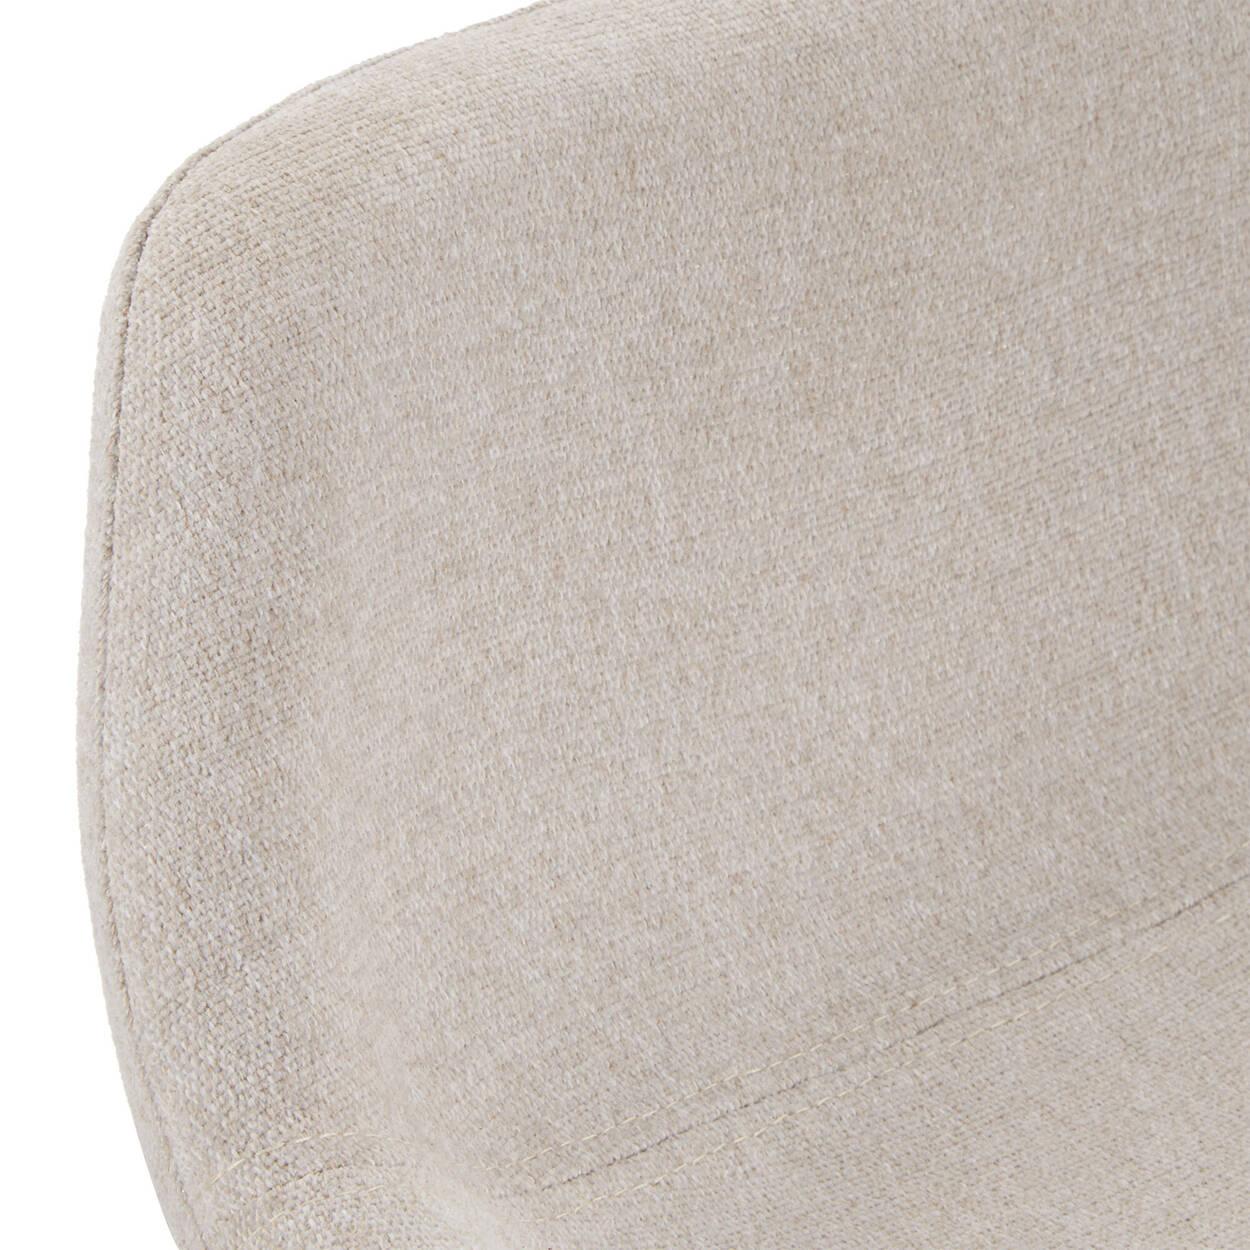 Fabric and Natural Wood Stool